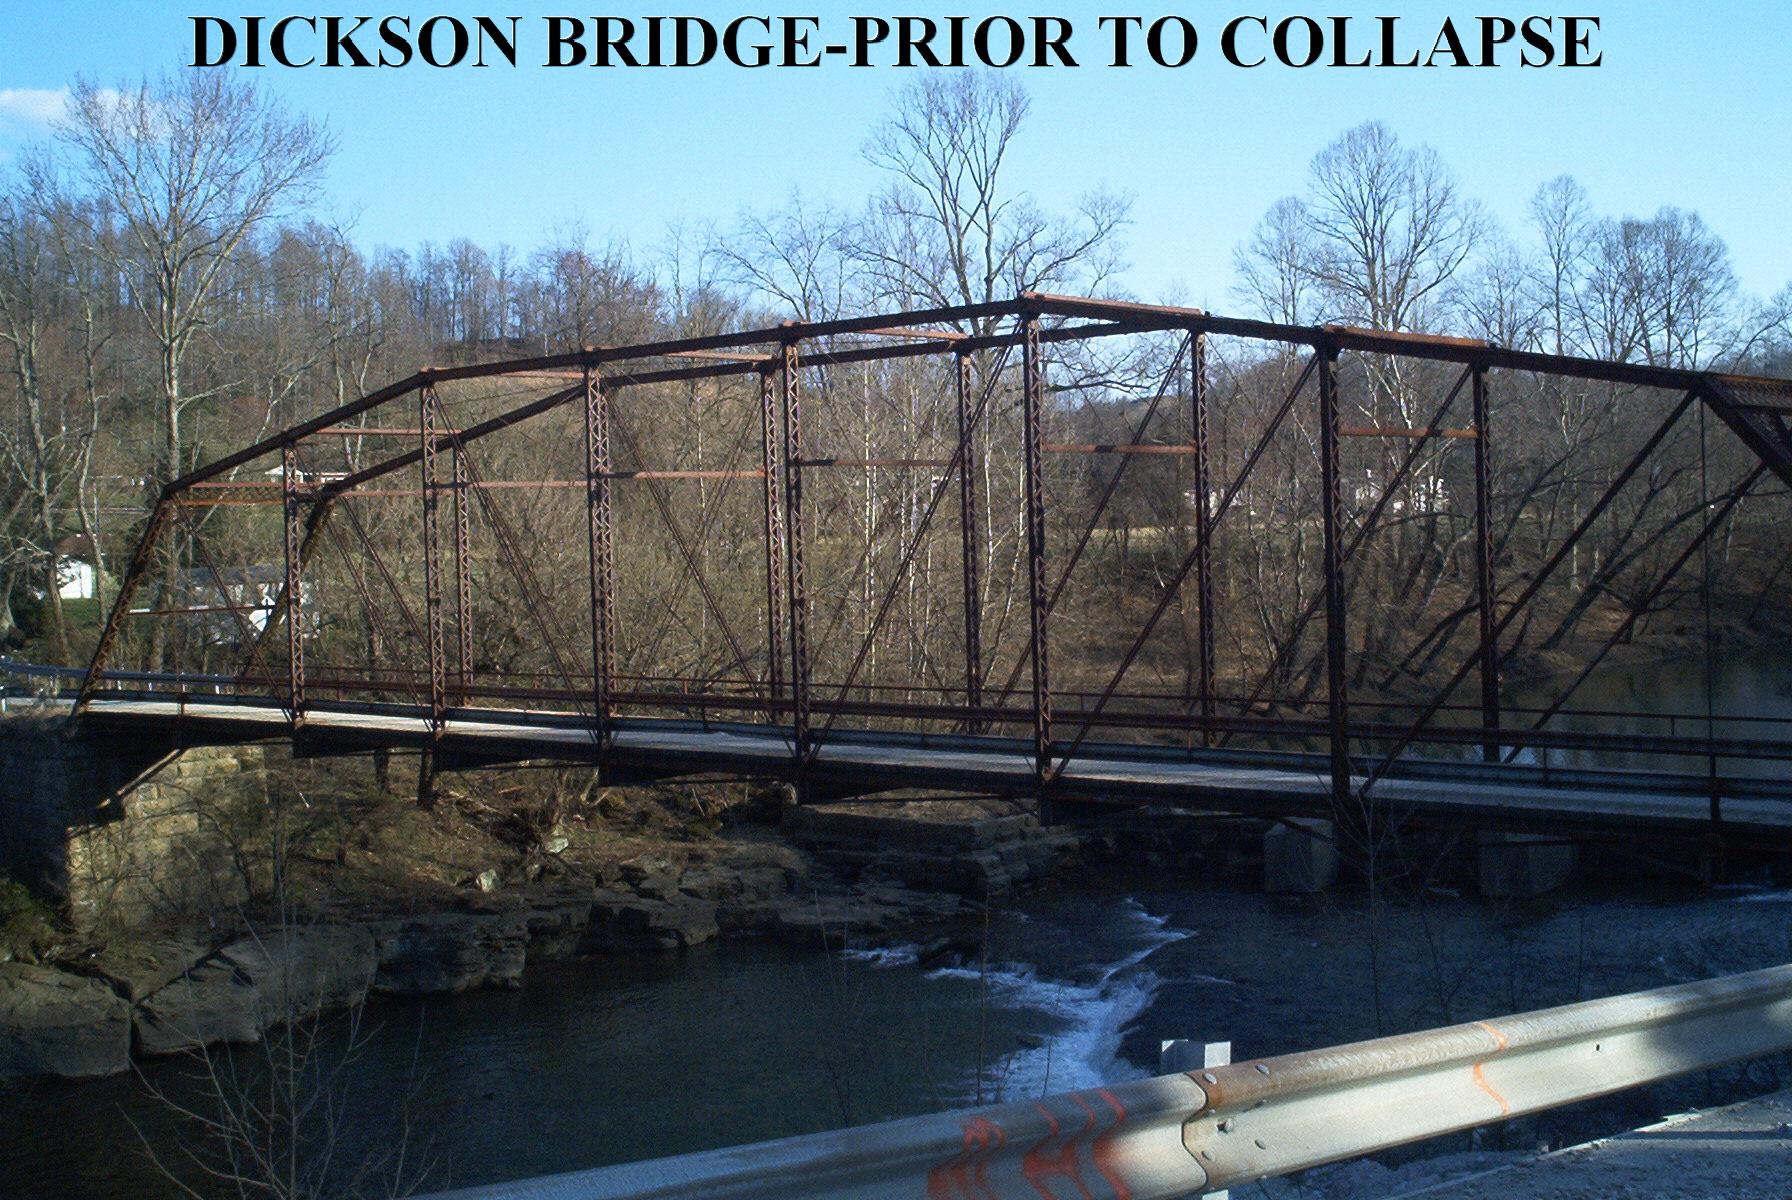 The bridge prior to collapse.